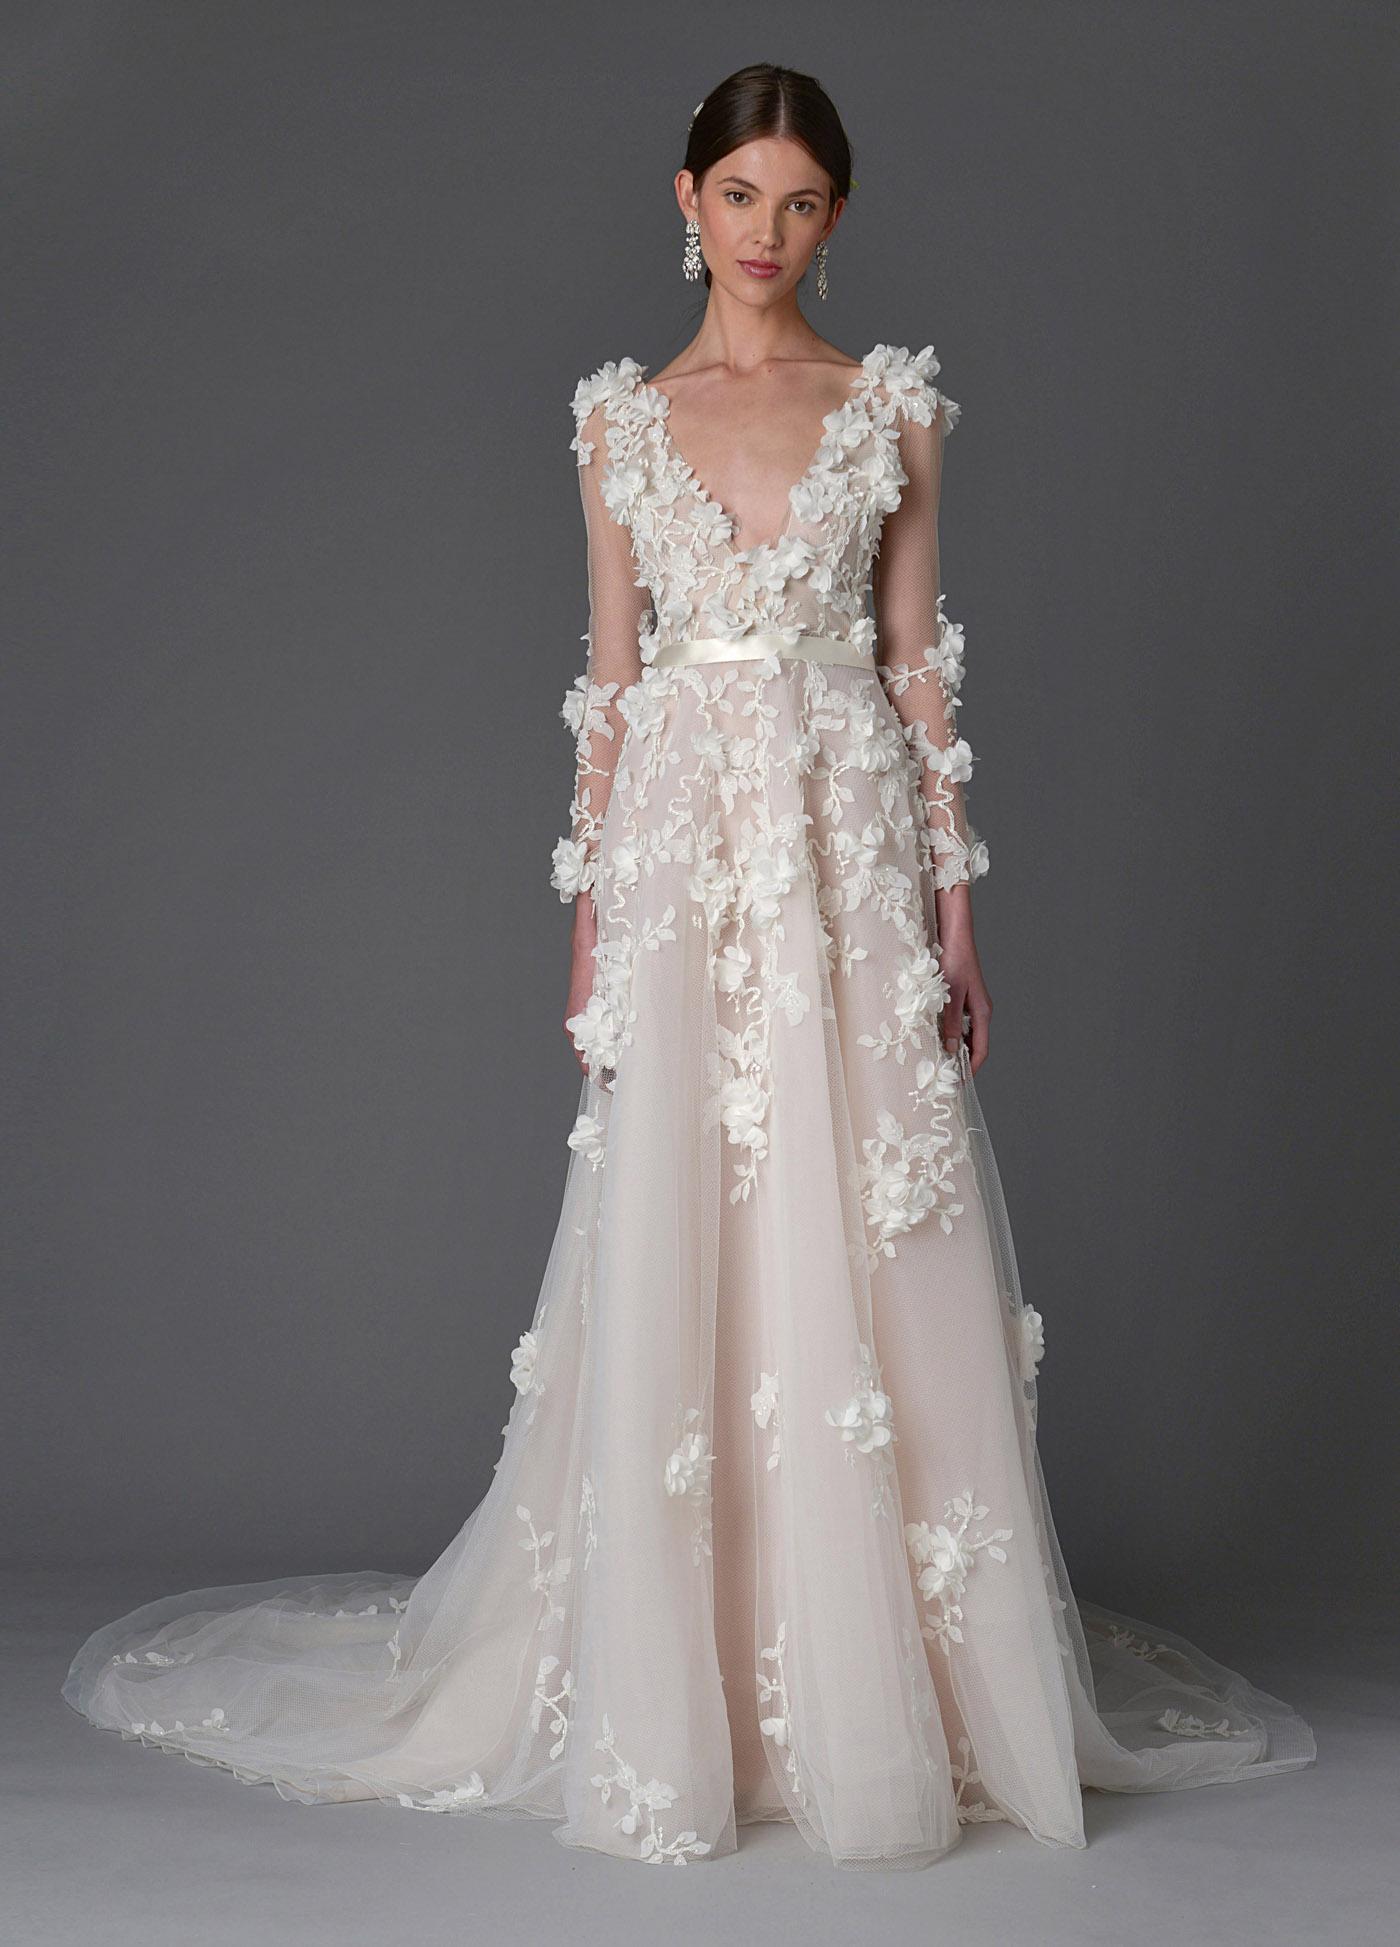 Marchesa Spring and Summer 2017 Bridal Collection 1 - Spring/Summer Wedding Dress Inspiration